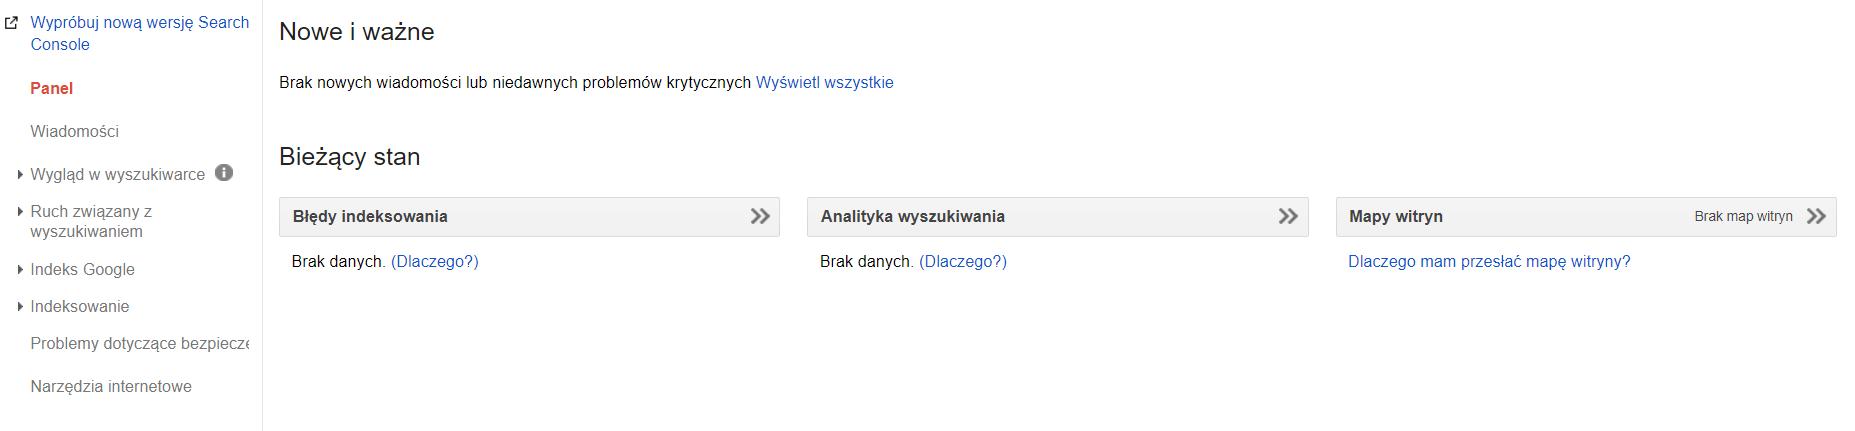 Kokpit Google Search Console